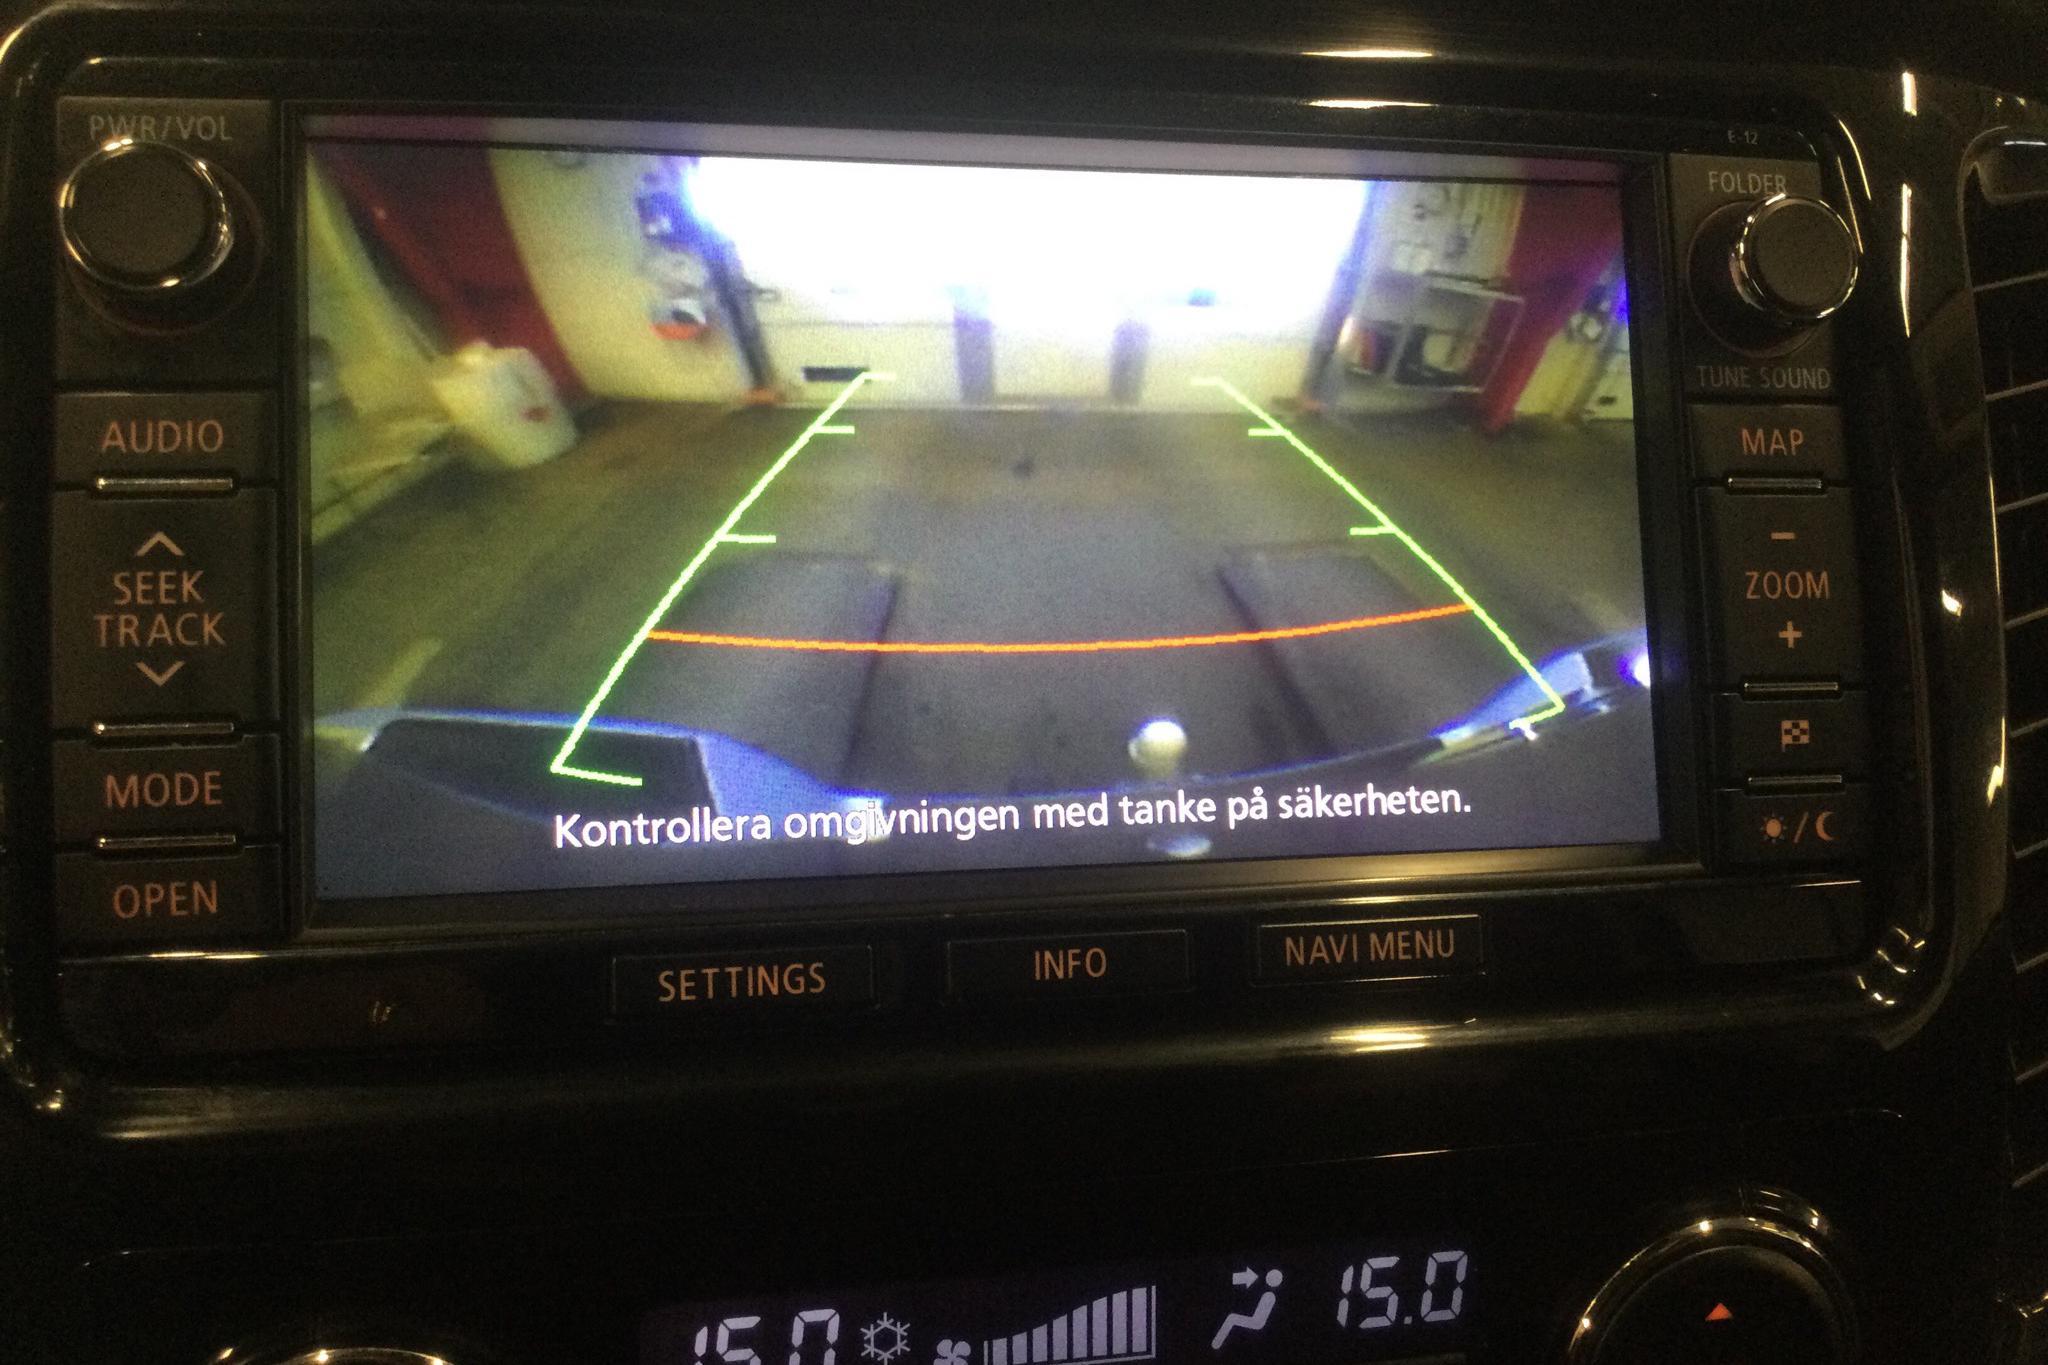 Mitsubishi L200 2.4 DI-D (181hk) - 133 040 km - Automatic - brown - 2016